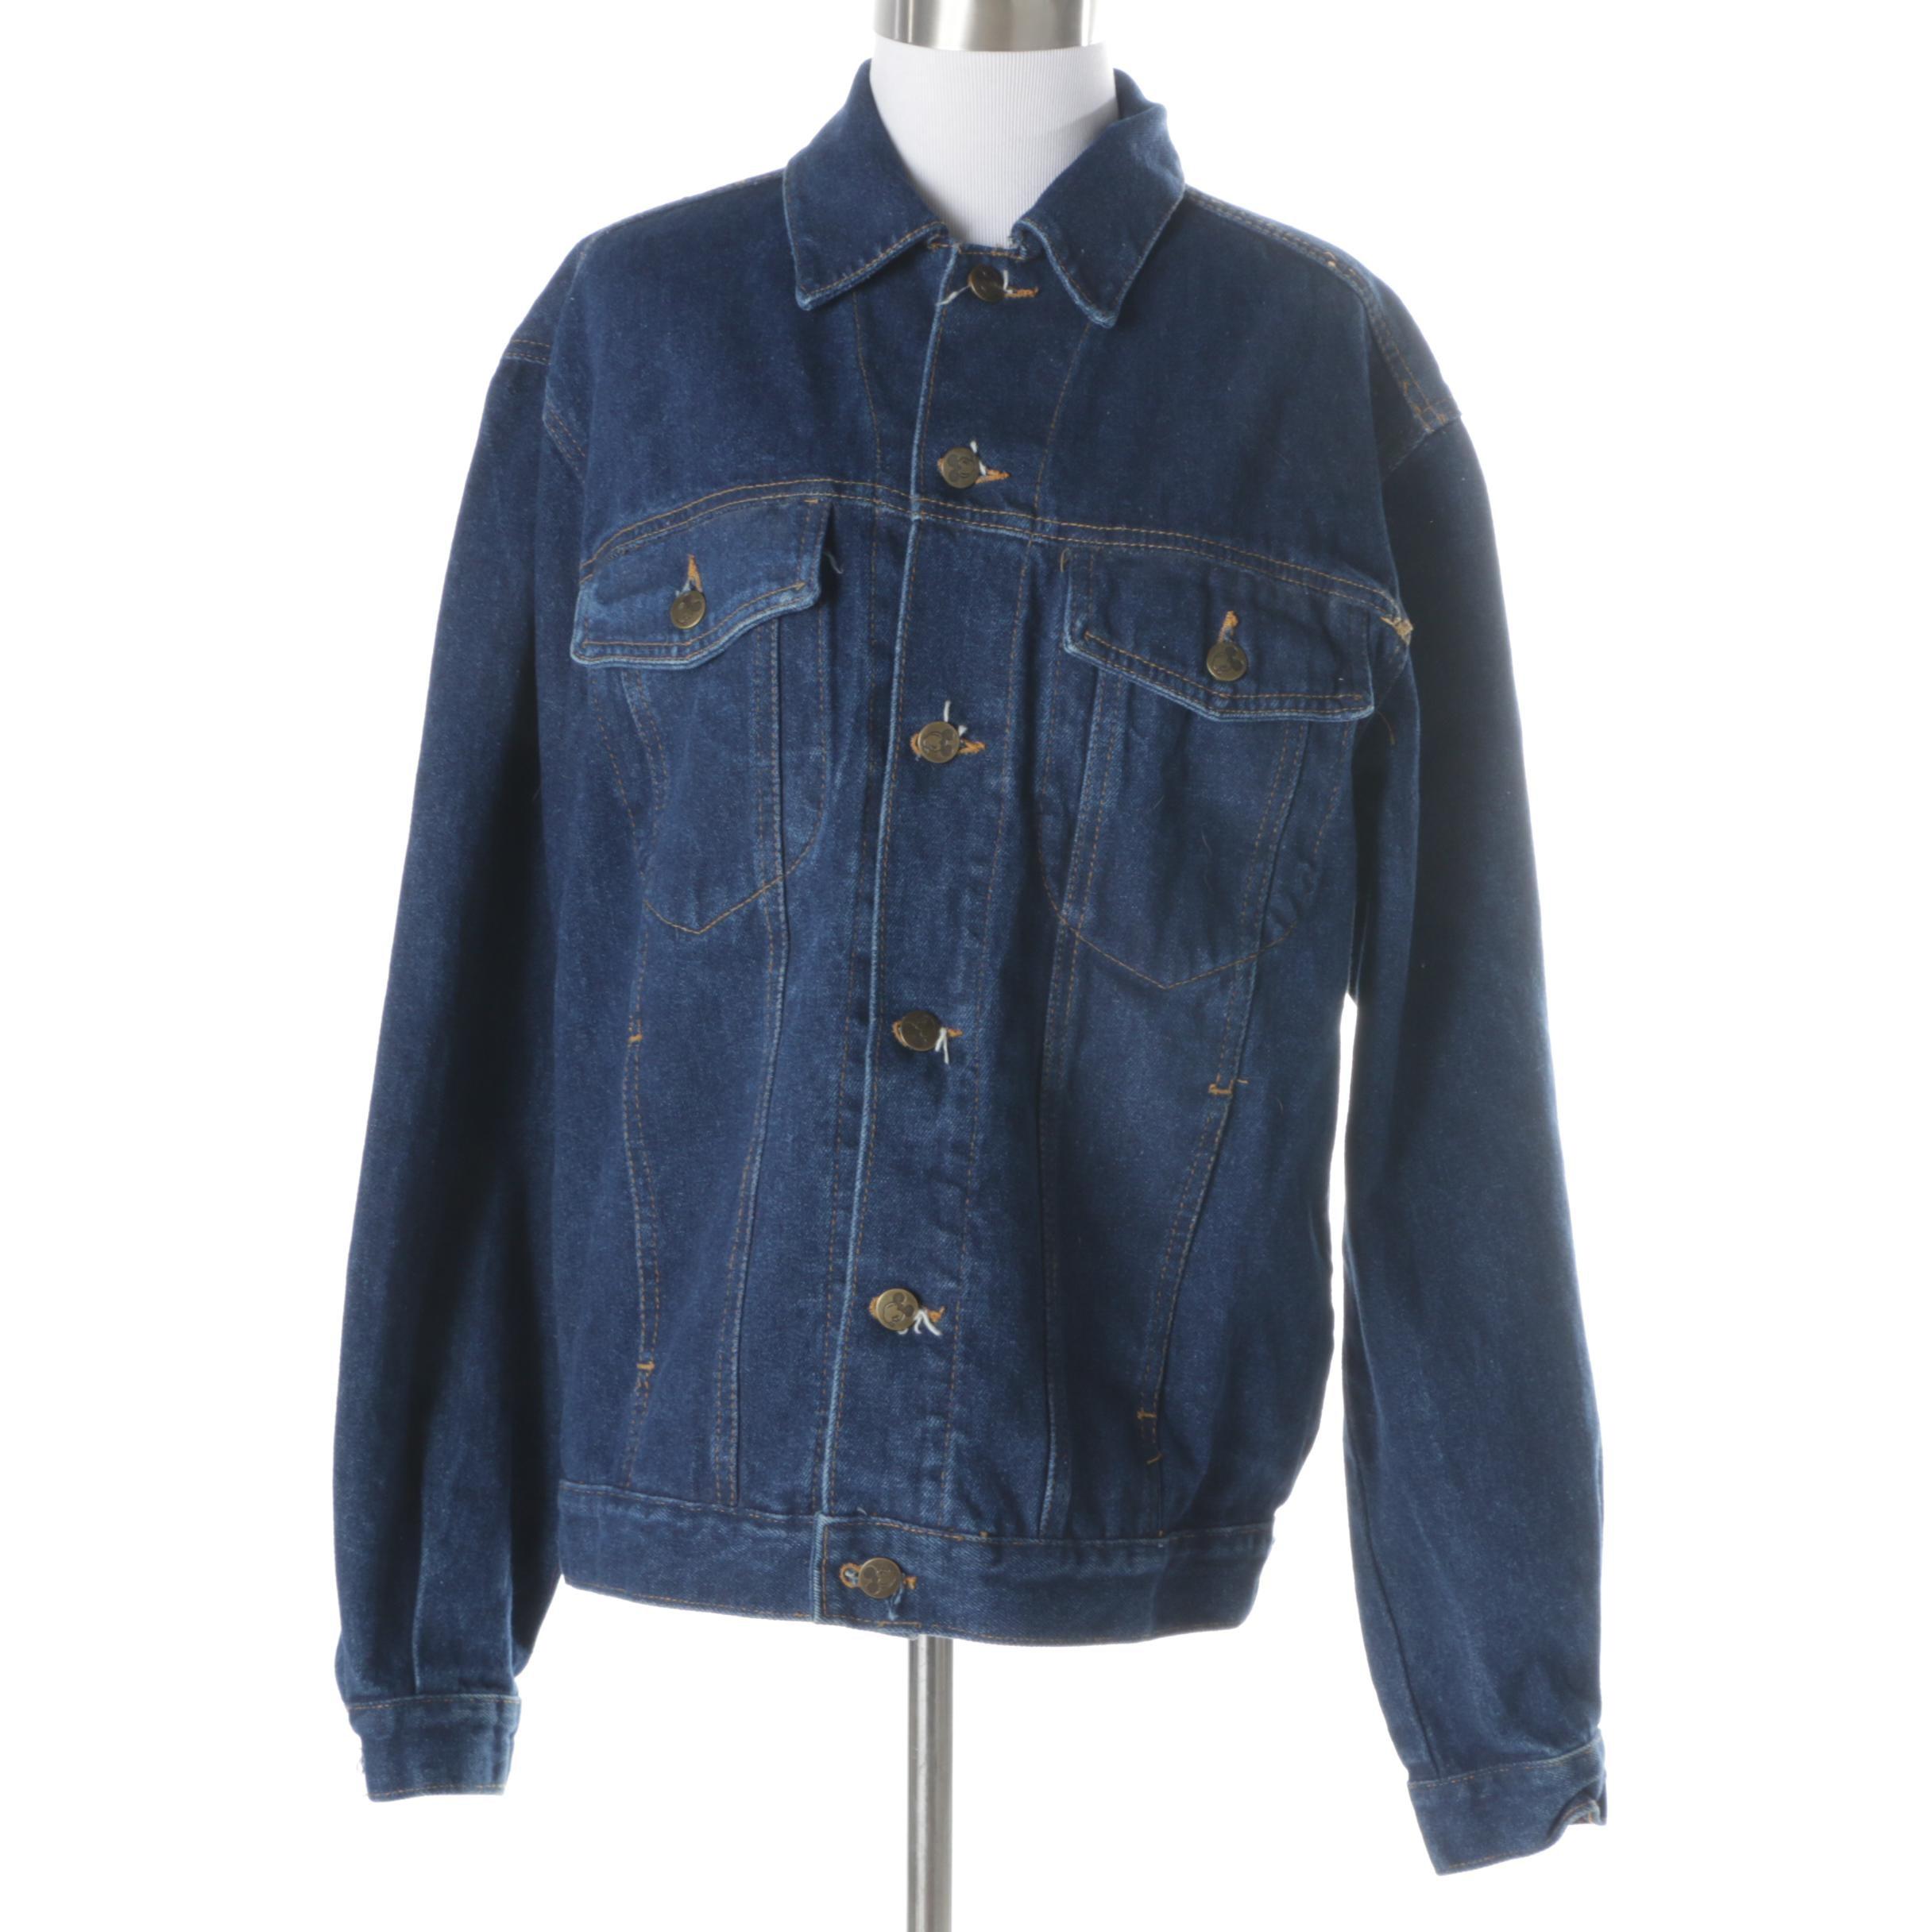 Vintage Mickey Themed Denim Jacket